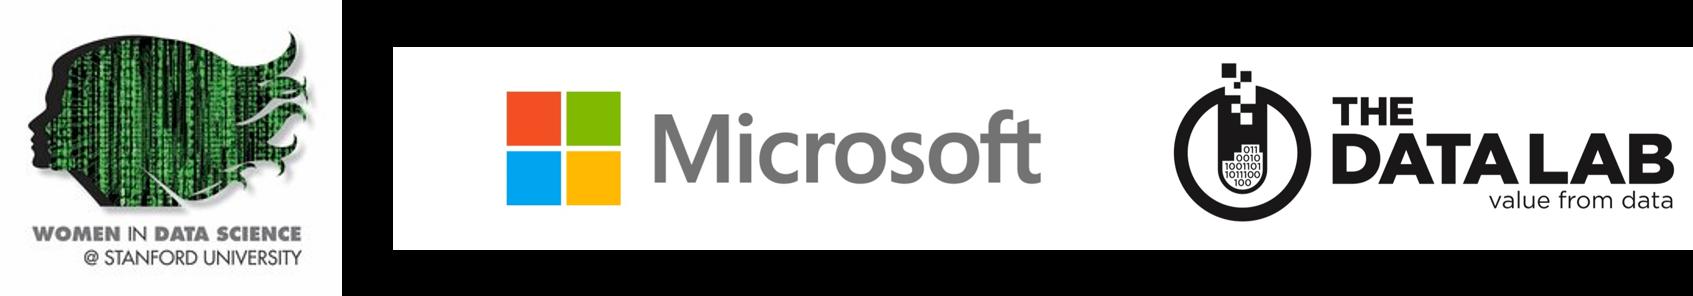 WIDS BANNER - Microsoft UK & The Data Lab